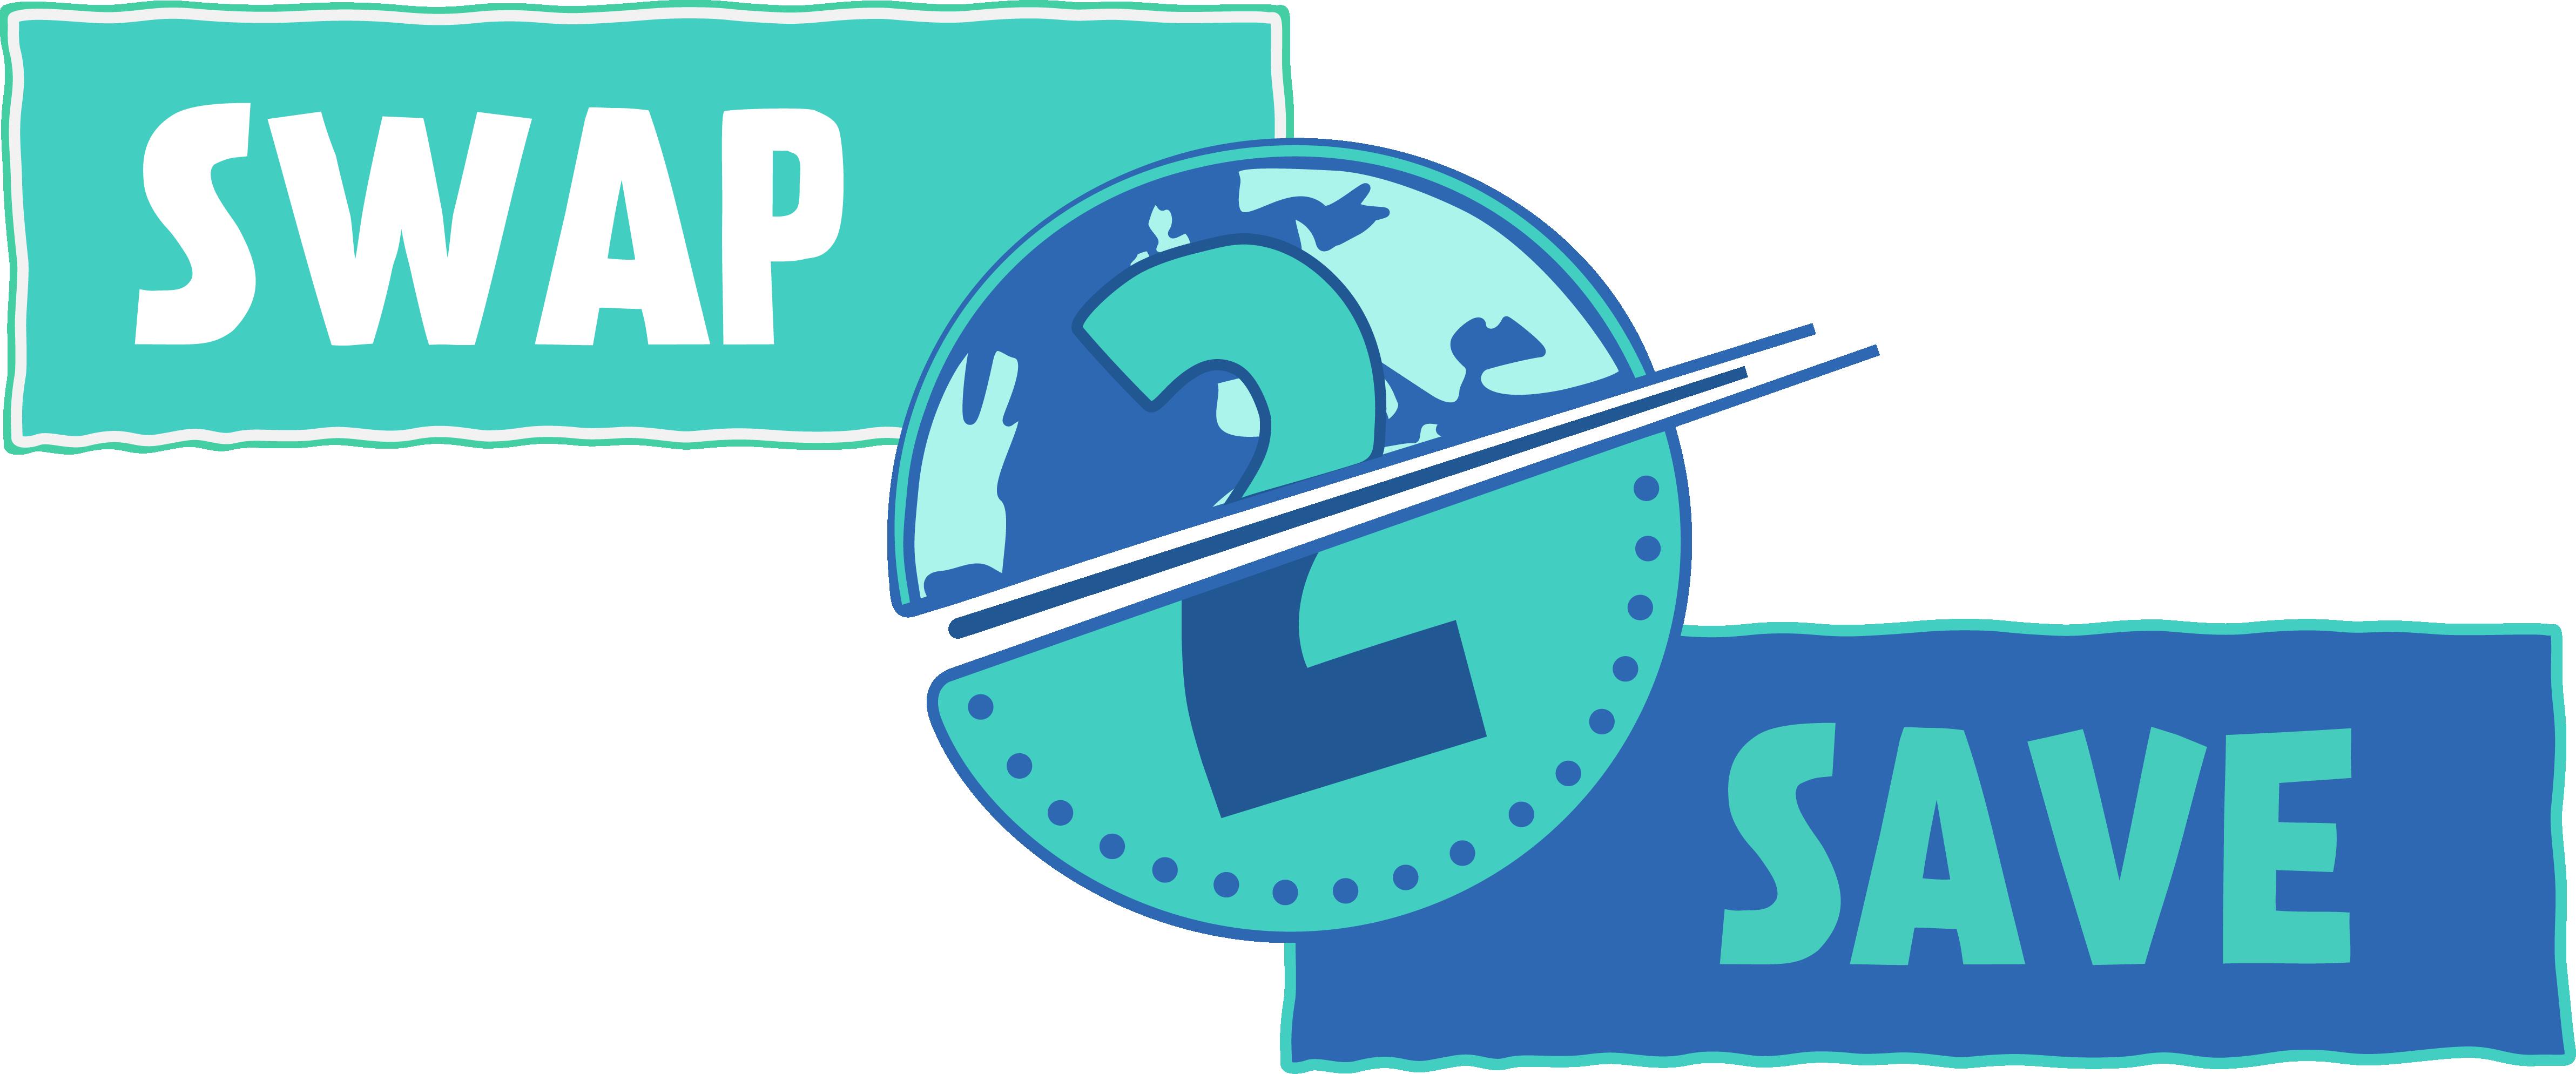 Logo to show the swap 2 save logo